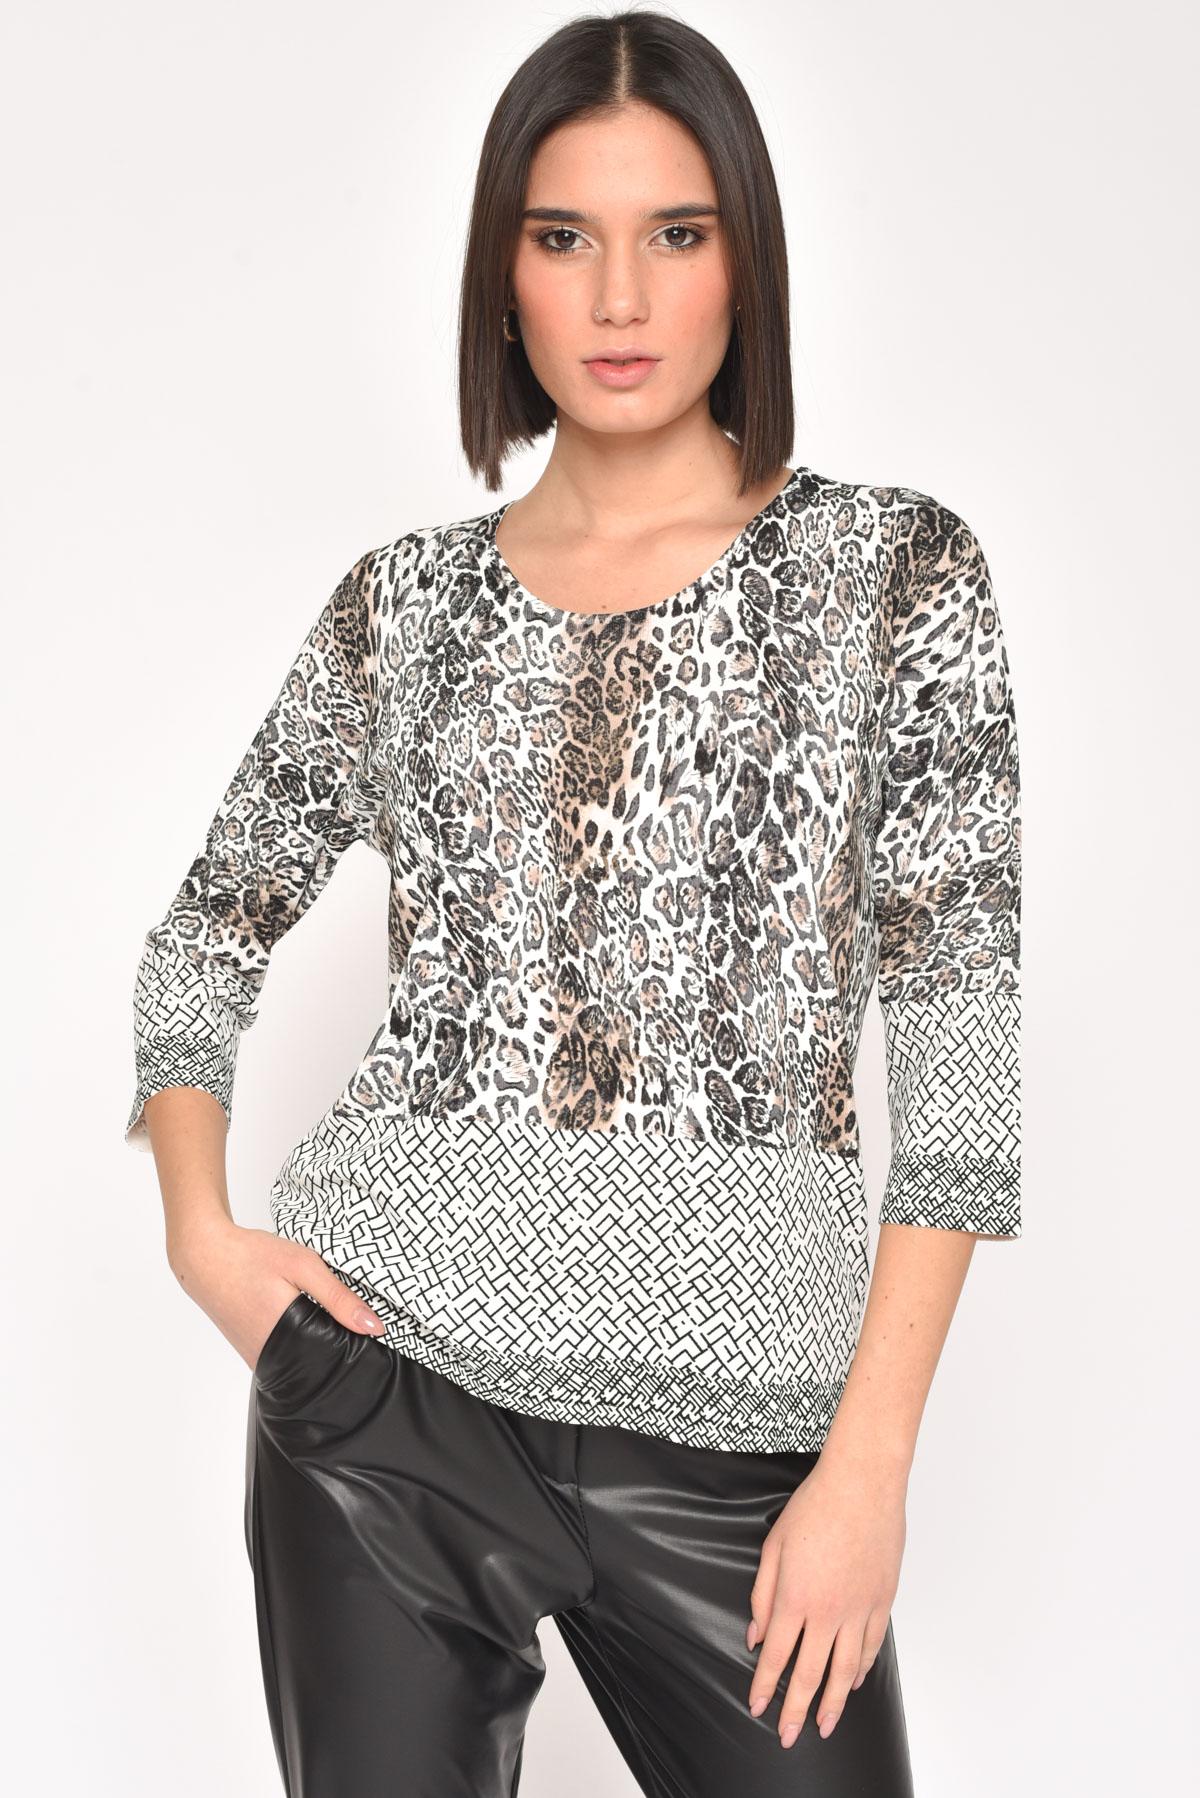 SPOTTED FANTASY VISCOSE BLOUSE for women - MACULATO - Paquito Pronto Moda Shop Online